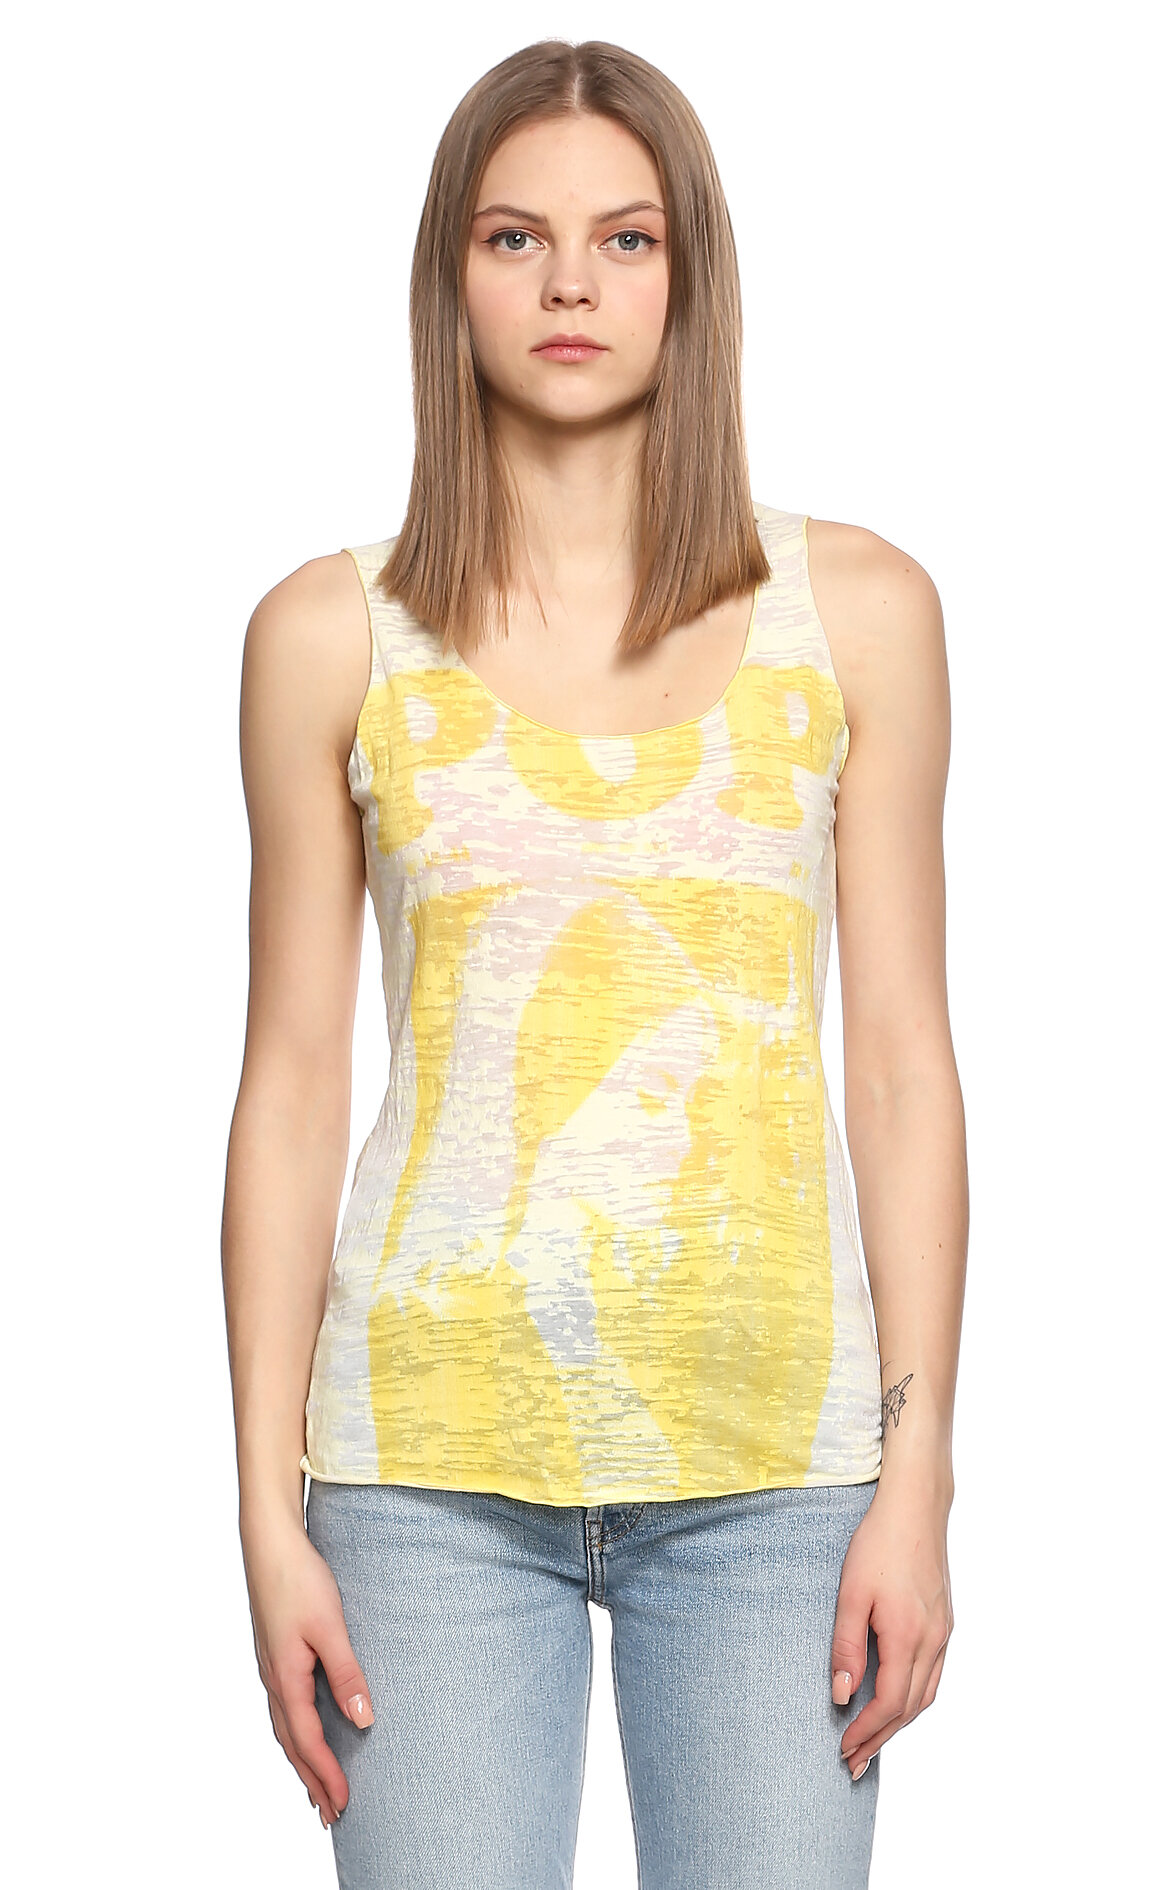 Fornarina Jeans-Fornarina Jeans Baskı Desen Kolsuz Sarı T-Shirt